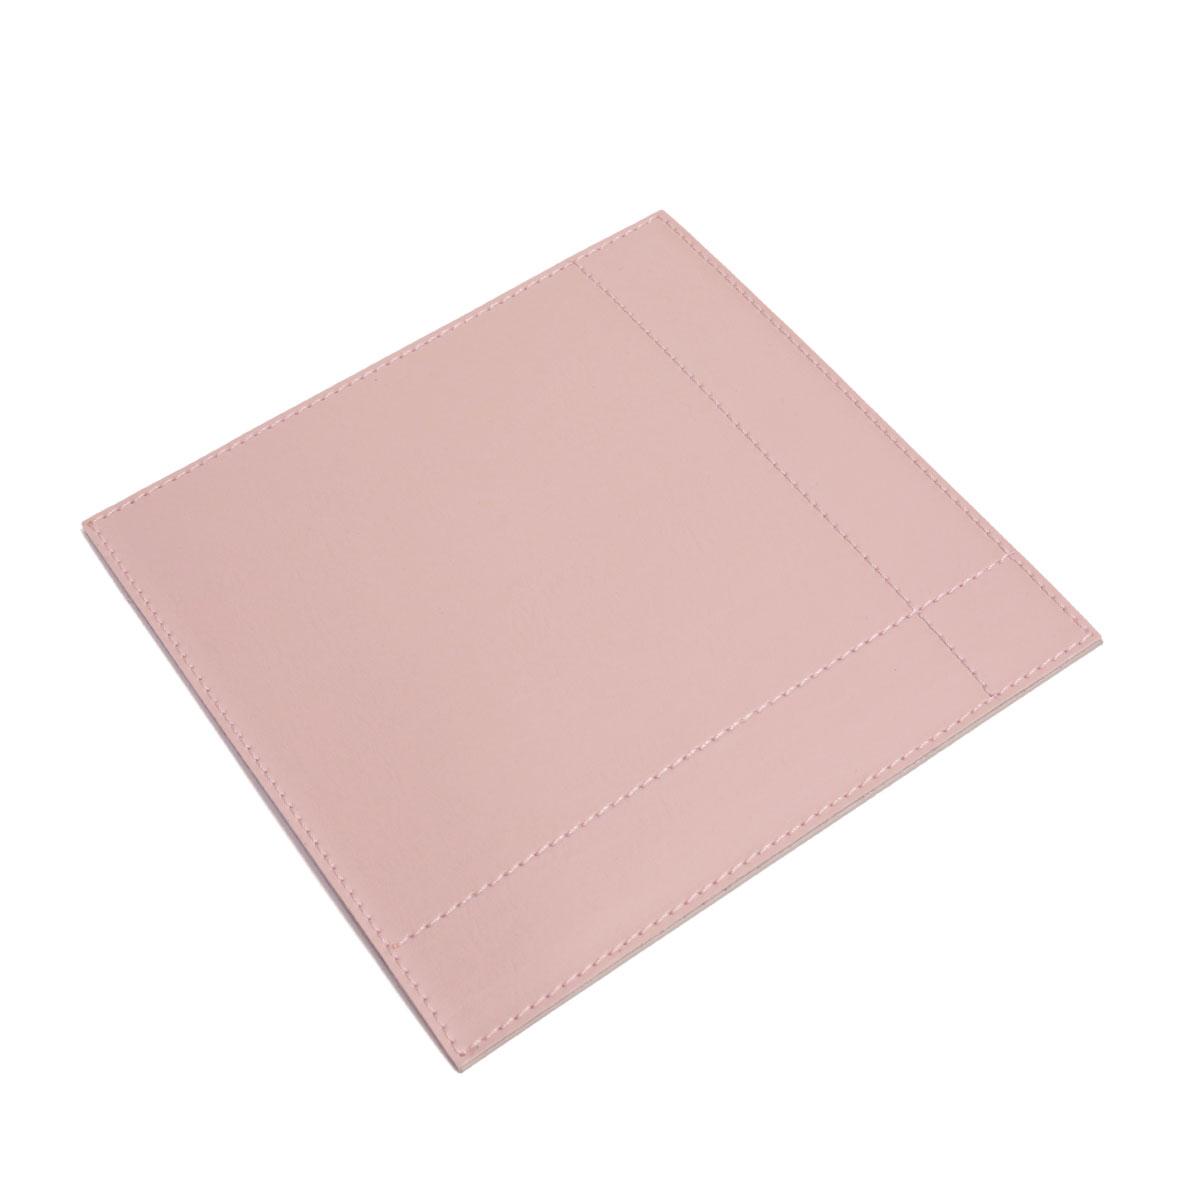 Mouse pad (Montana Rosé)